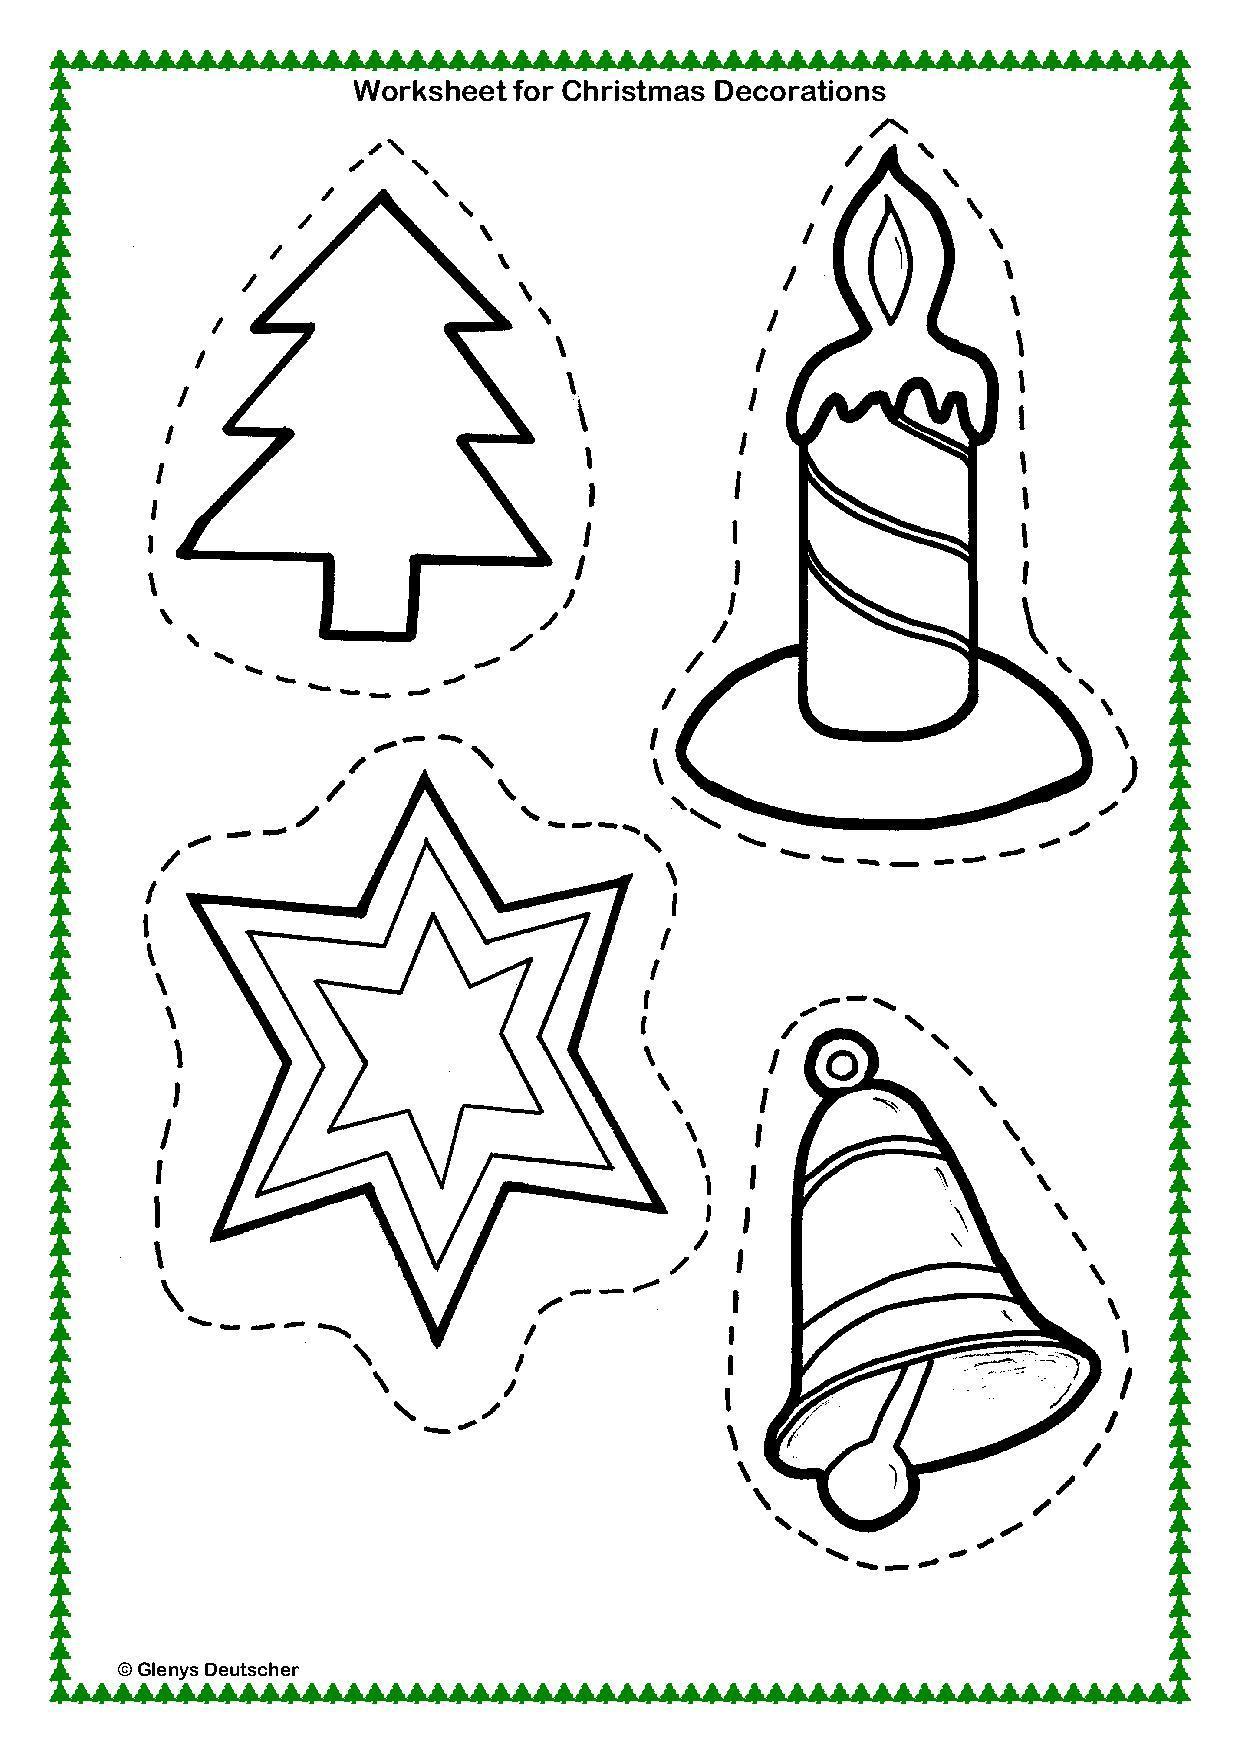 Christmas Art And Craft - Free Large Images   Christmas